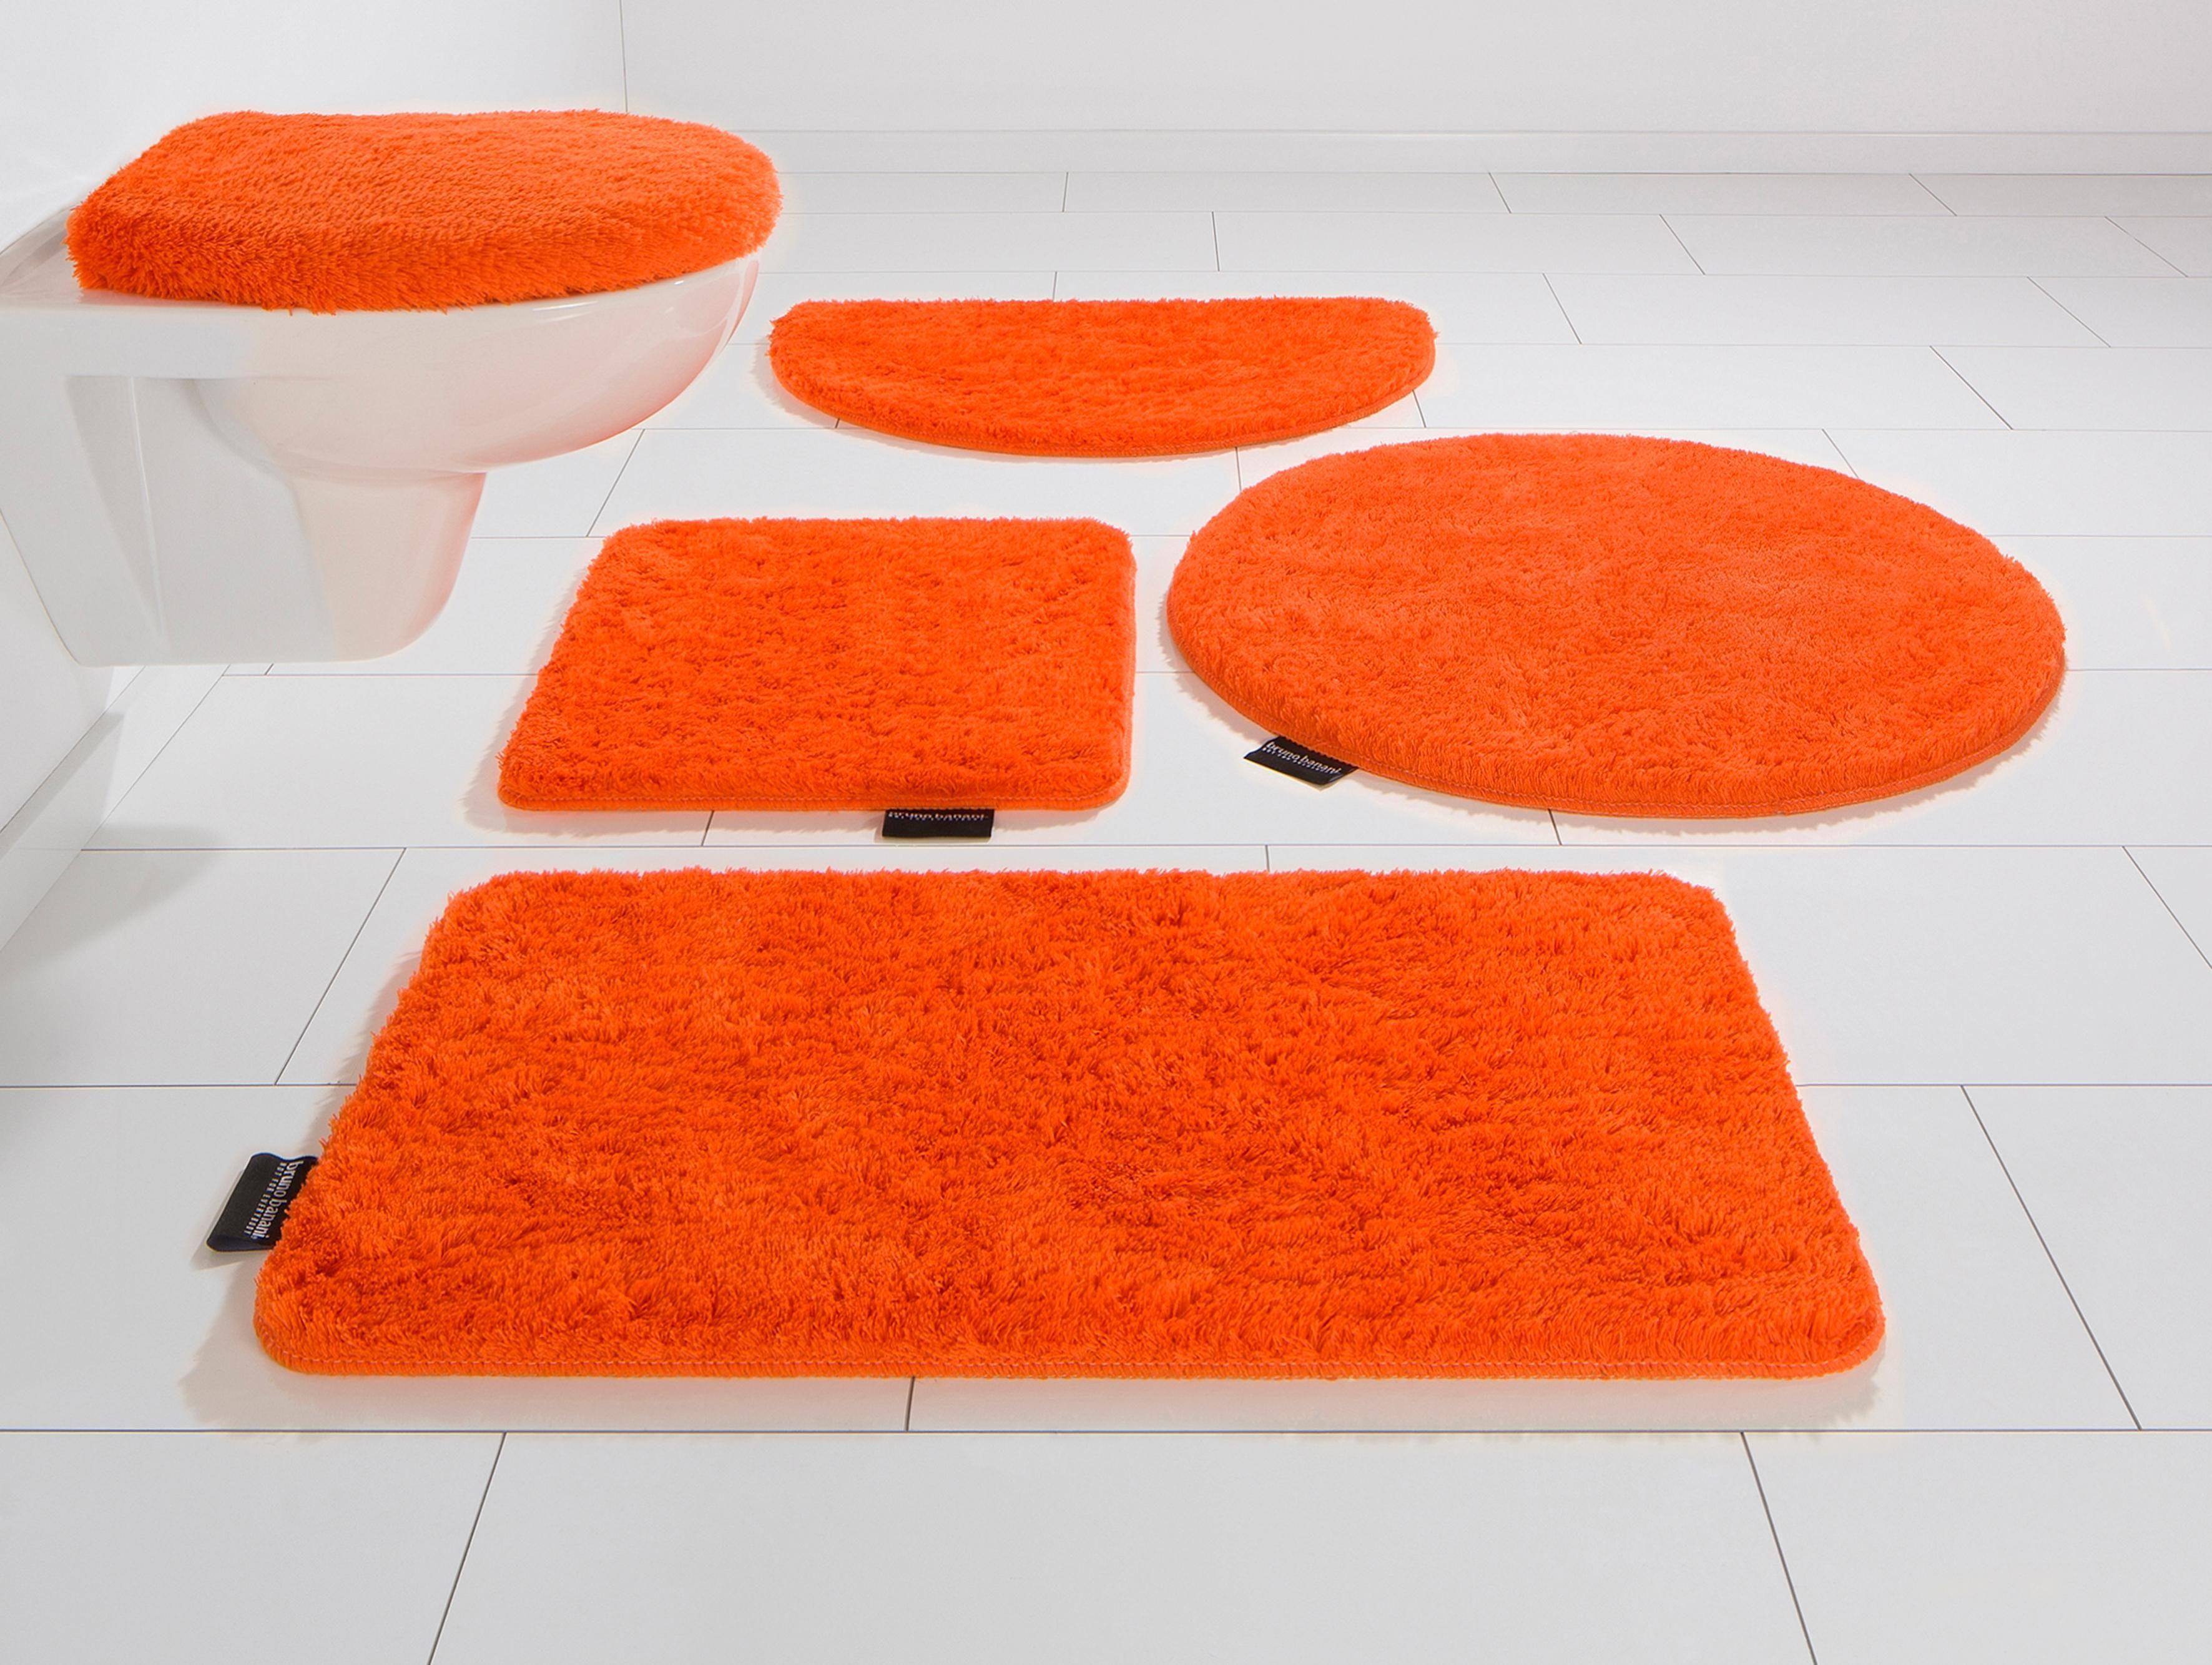 Badematte Lana Höhe 25 mm rutschhemmend beschichtet fußbodenheizungsgeeignet orange 1 (rechteckig 55x50 cm),2 (rechteckig 50x90 cm),3 (rechteckig 60x100 cm),4 (rechteckig 70x110 cm),5 (rechteckig 80x150 cm),6 (rechteckig 90x160 cm)